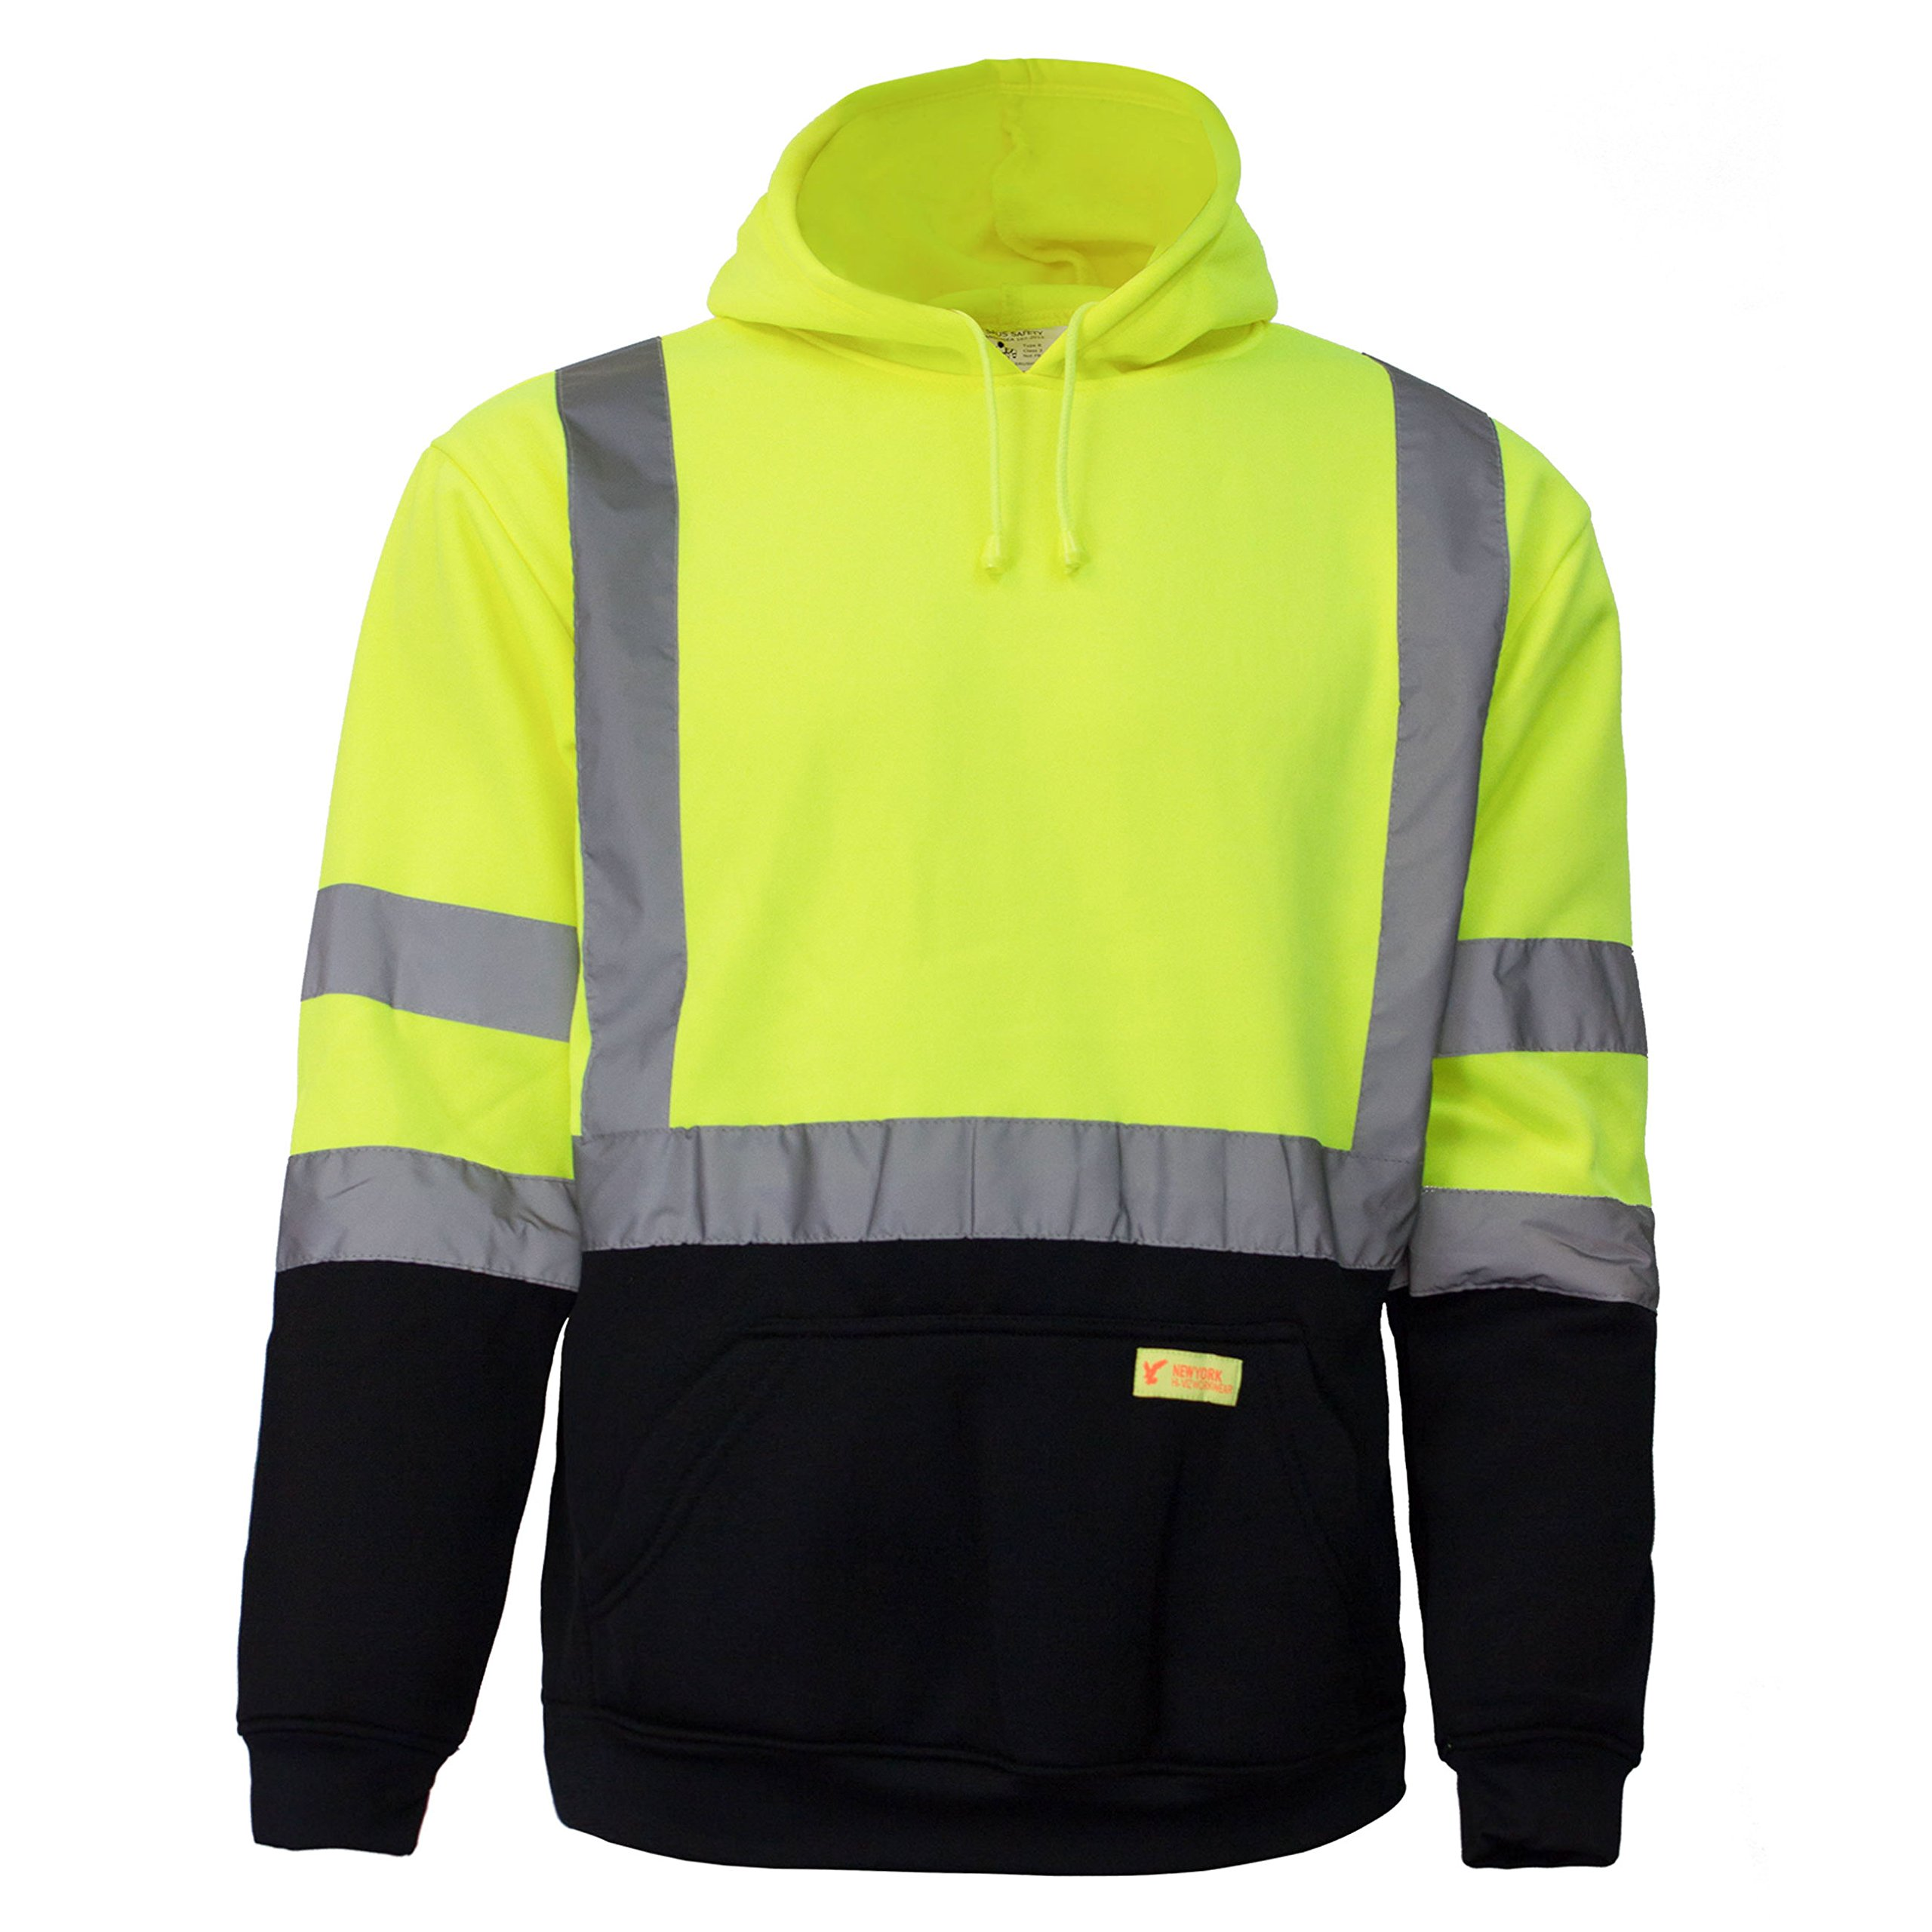 New York Hi-Viz Workwear H8312 Men's ANSI Class 3 High Visibility Class 3 Sweatshirt, Hooded Pullover, Knit Lining, Black Bottom (Lime, Large) by New York Hi-Viz Workwear (Image #2)